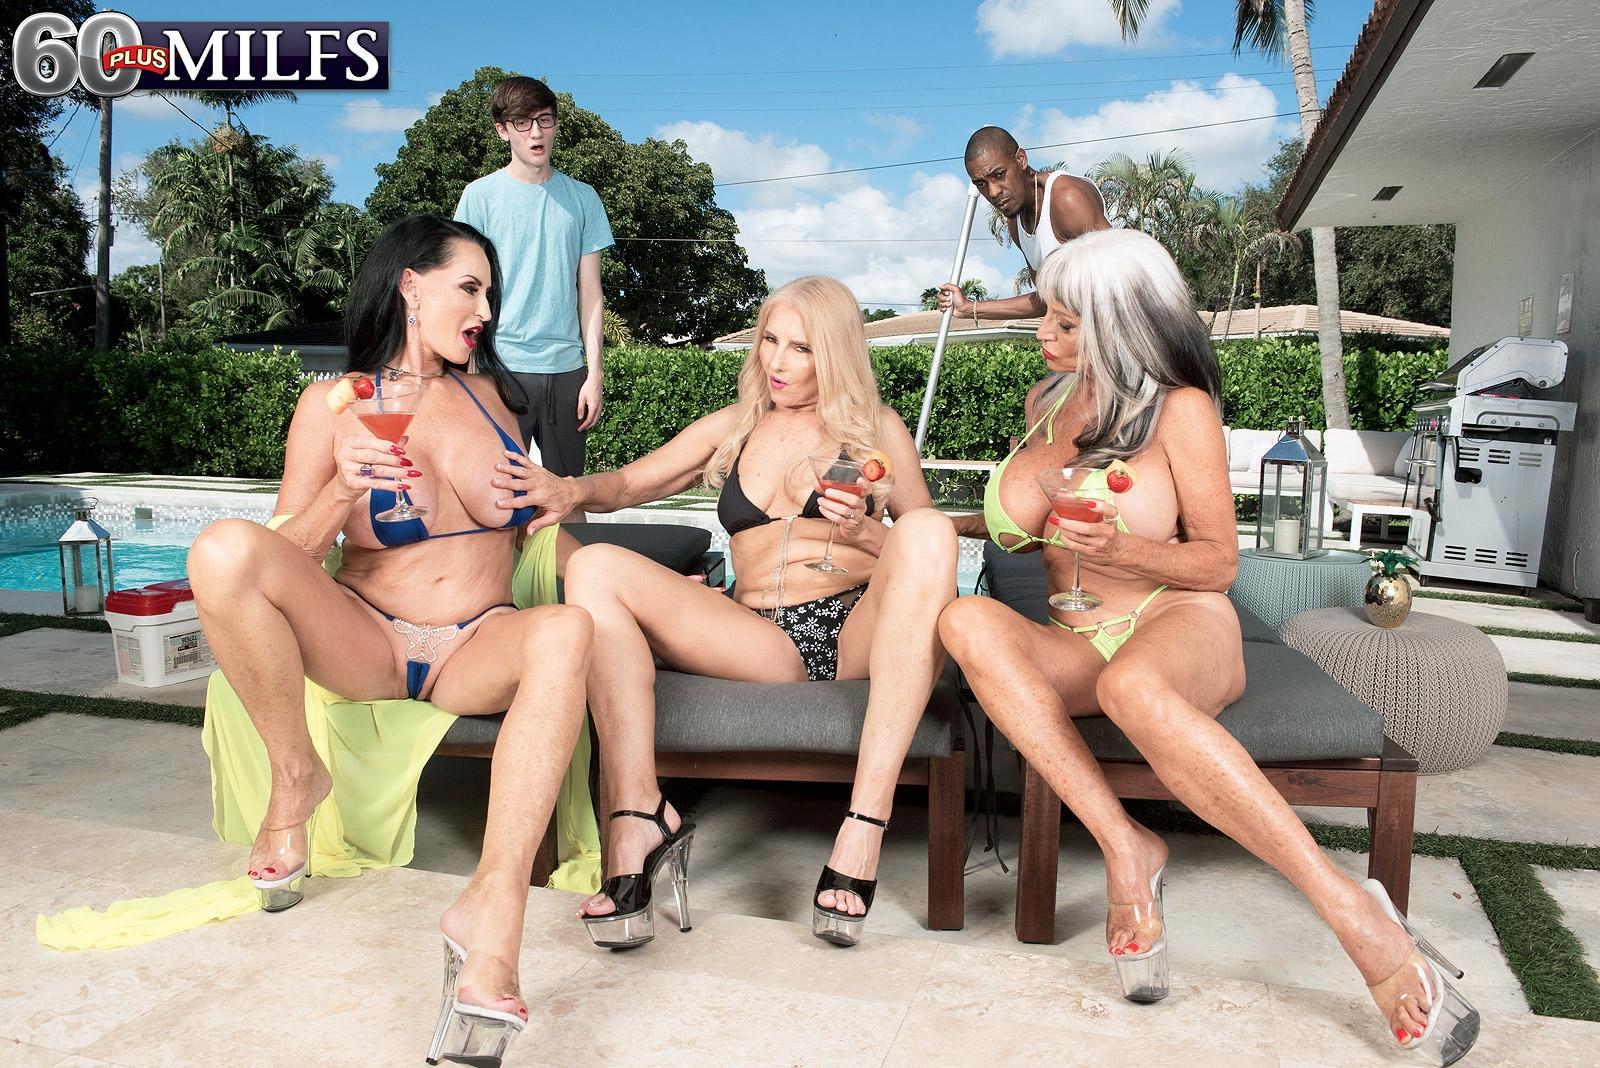 Granny pornstar Rita Daniels and her girlfriends seduce the pool cleaning boys